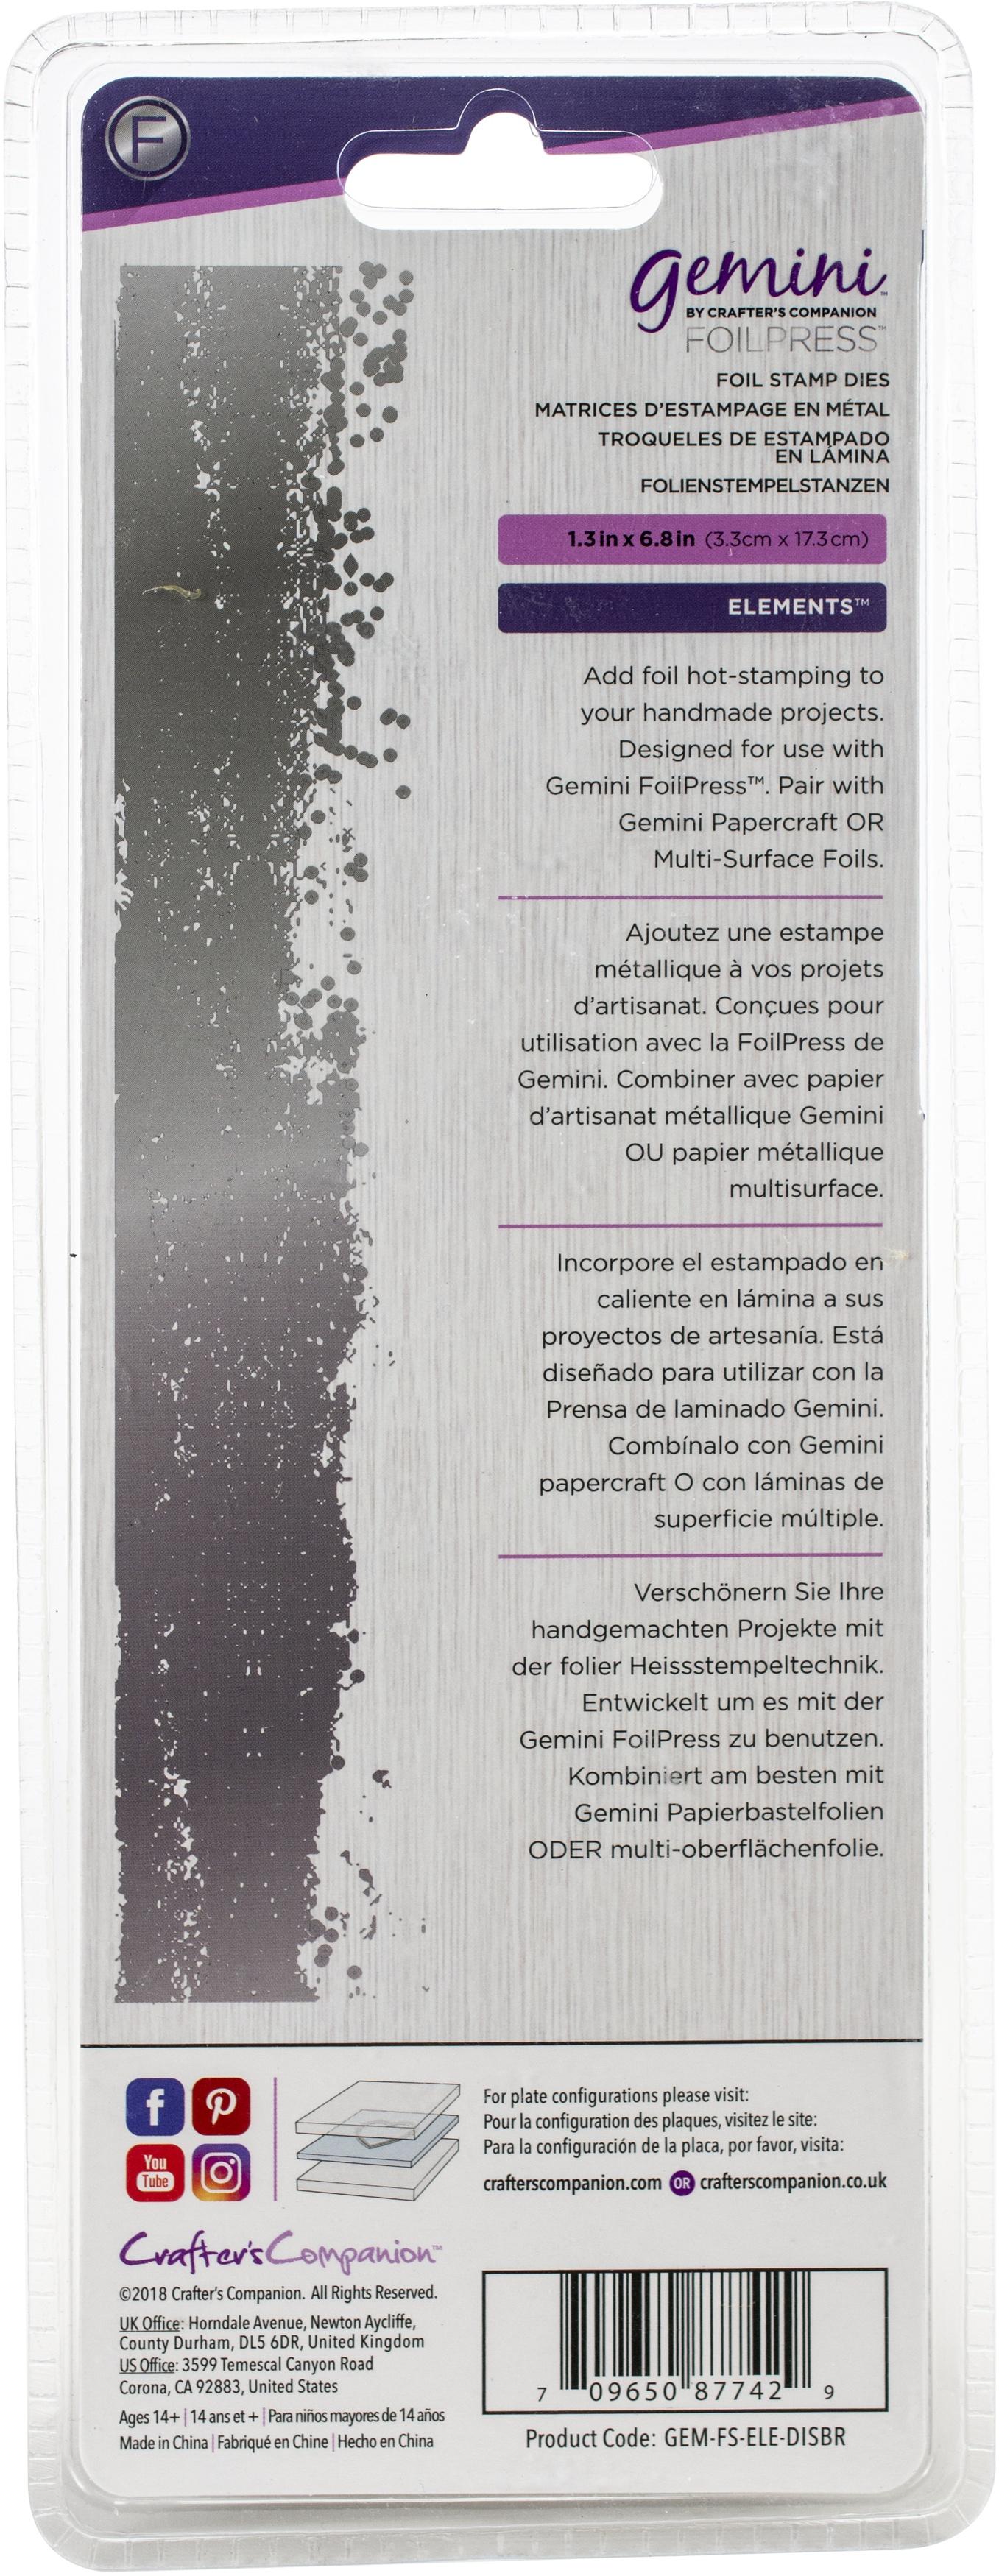 Gemini Foilpress Stamp Die Elements-Distress Border